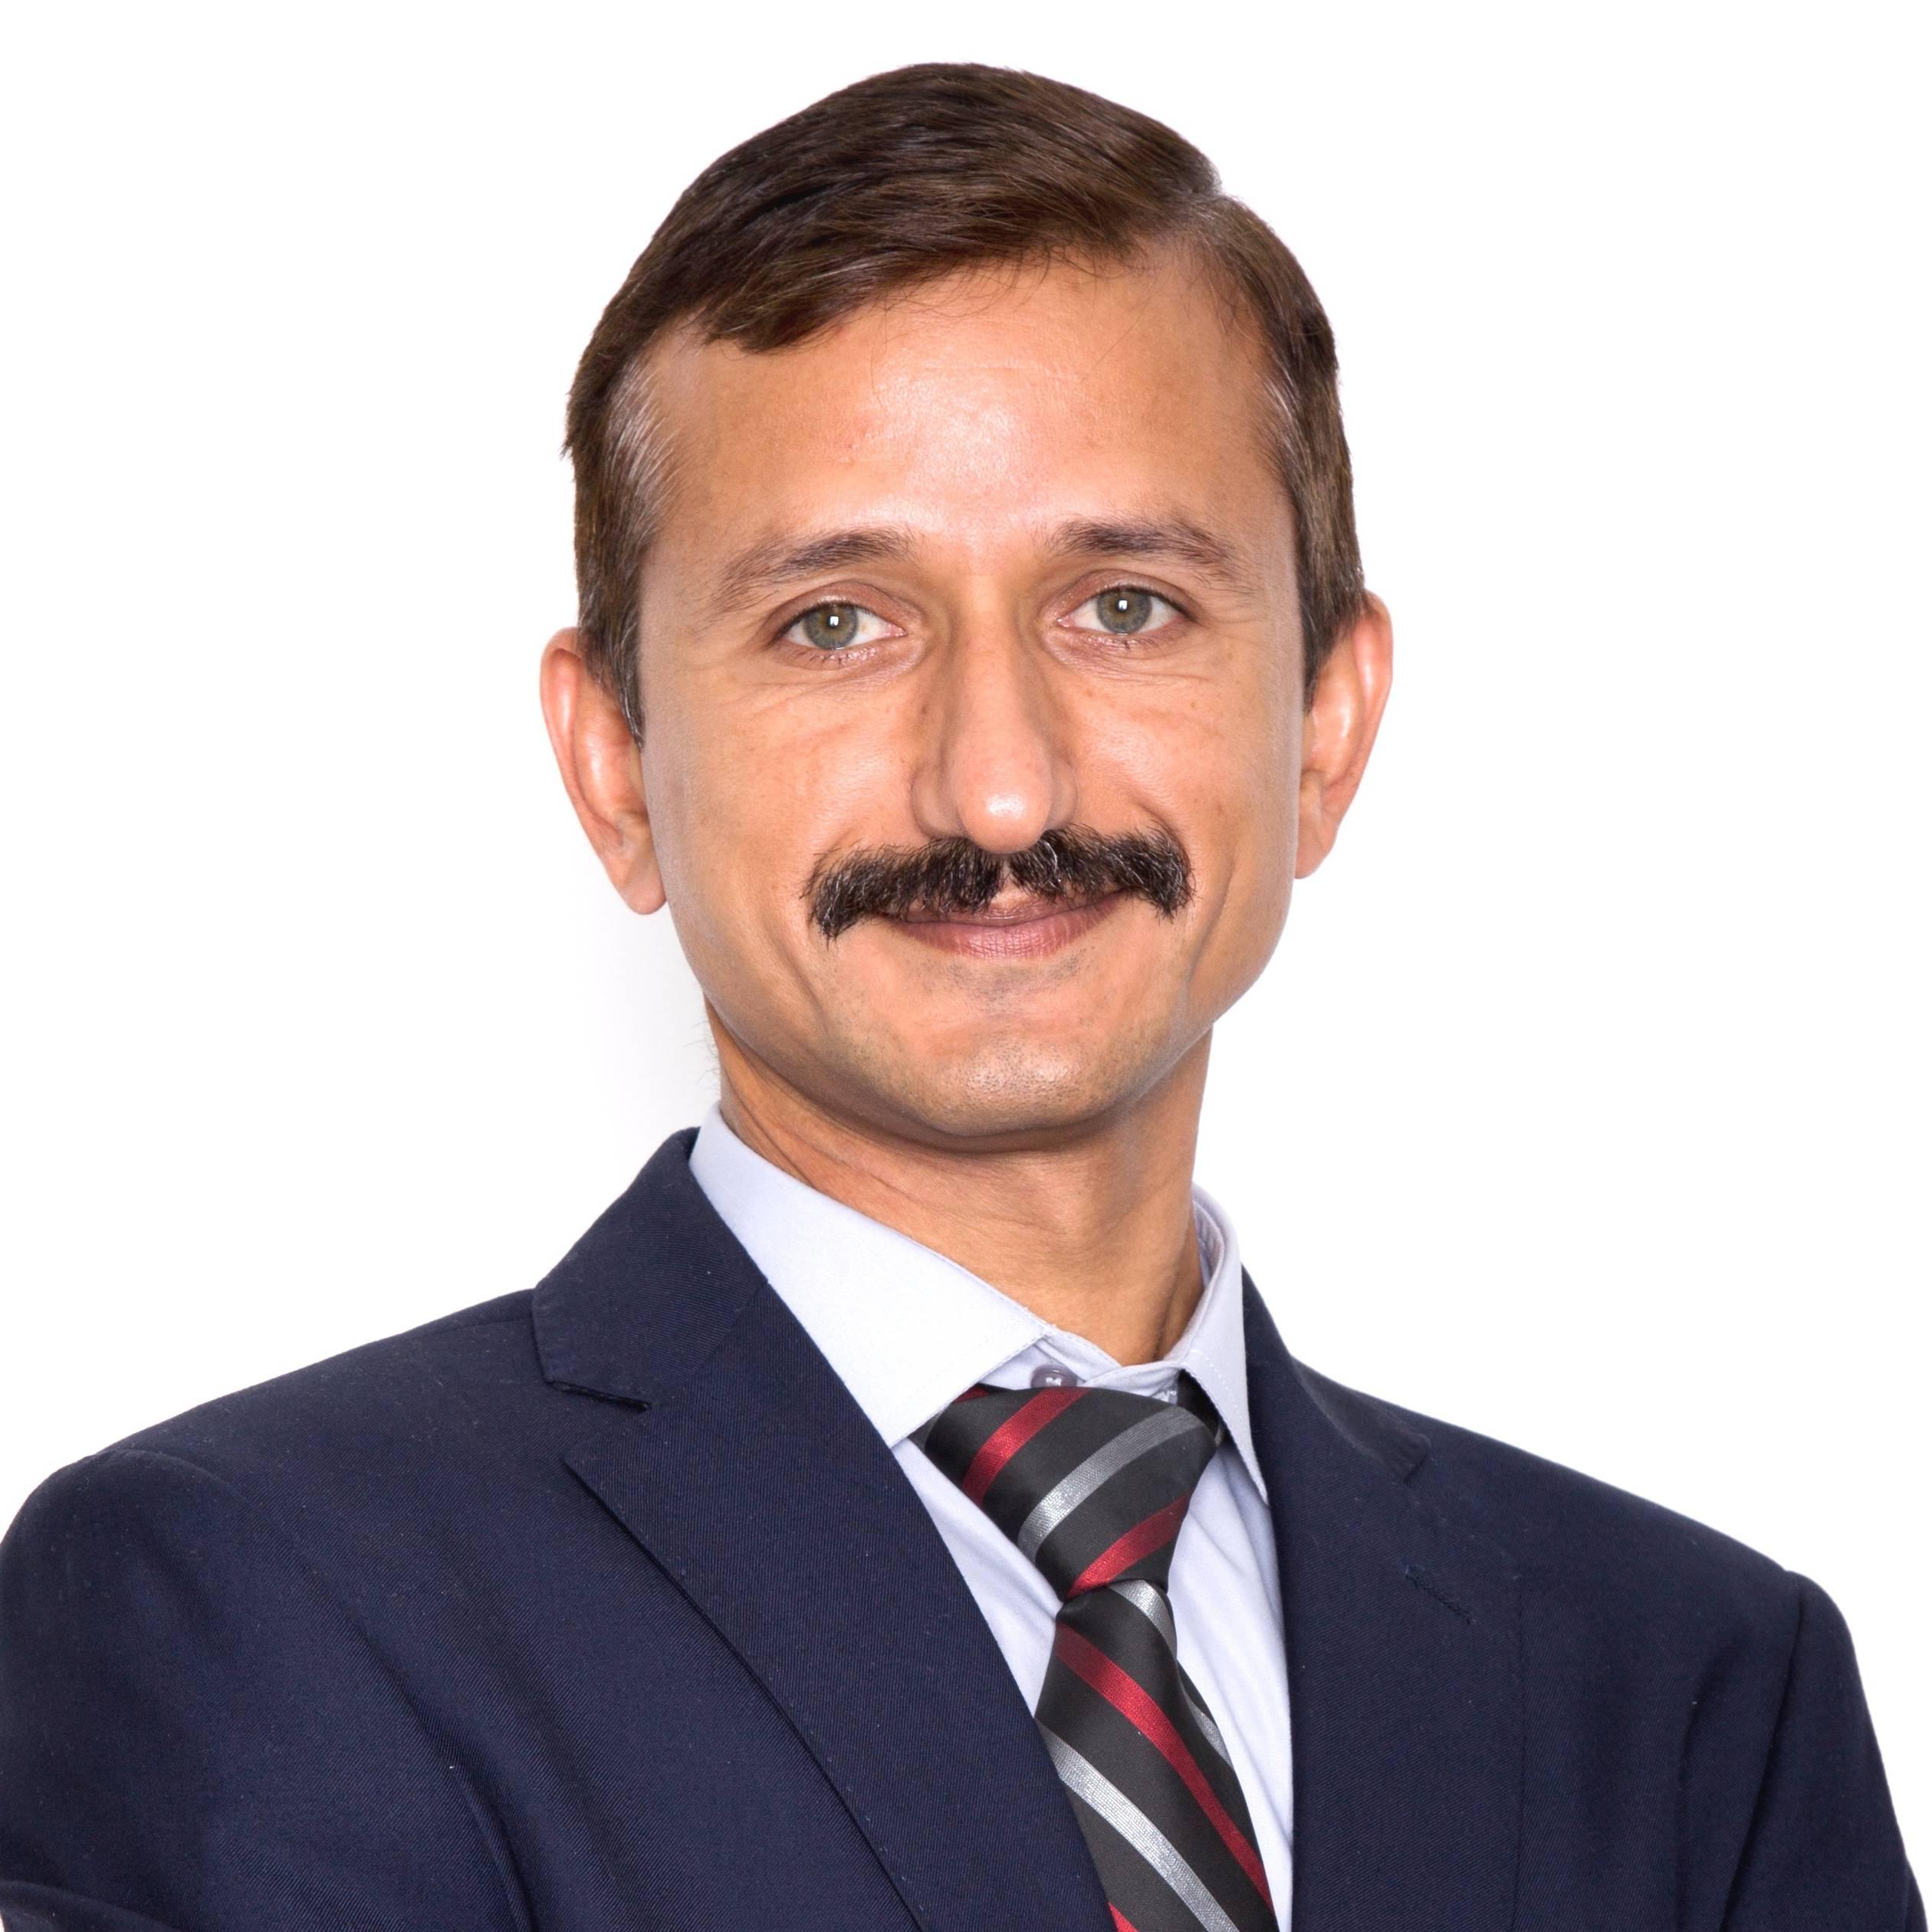 Irfan Sadiq